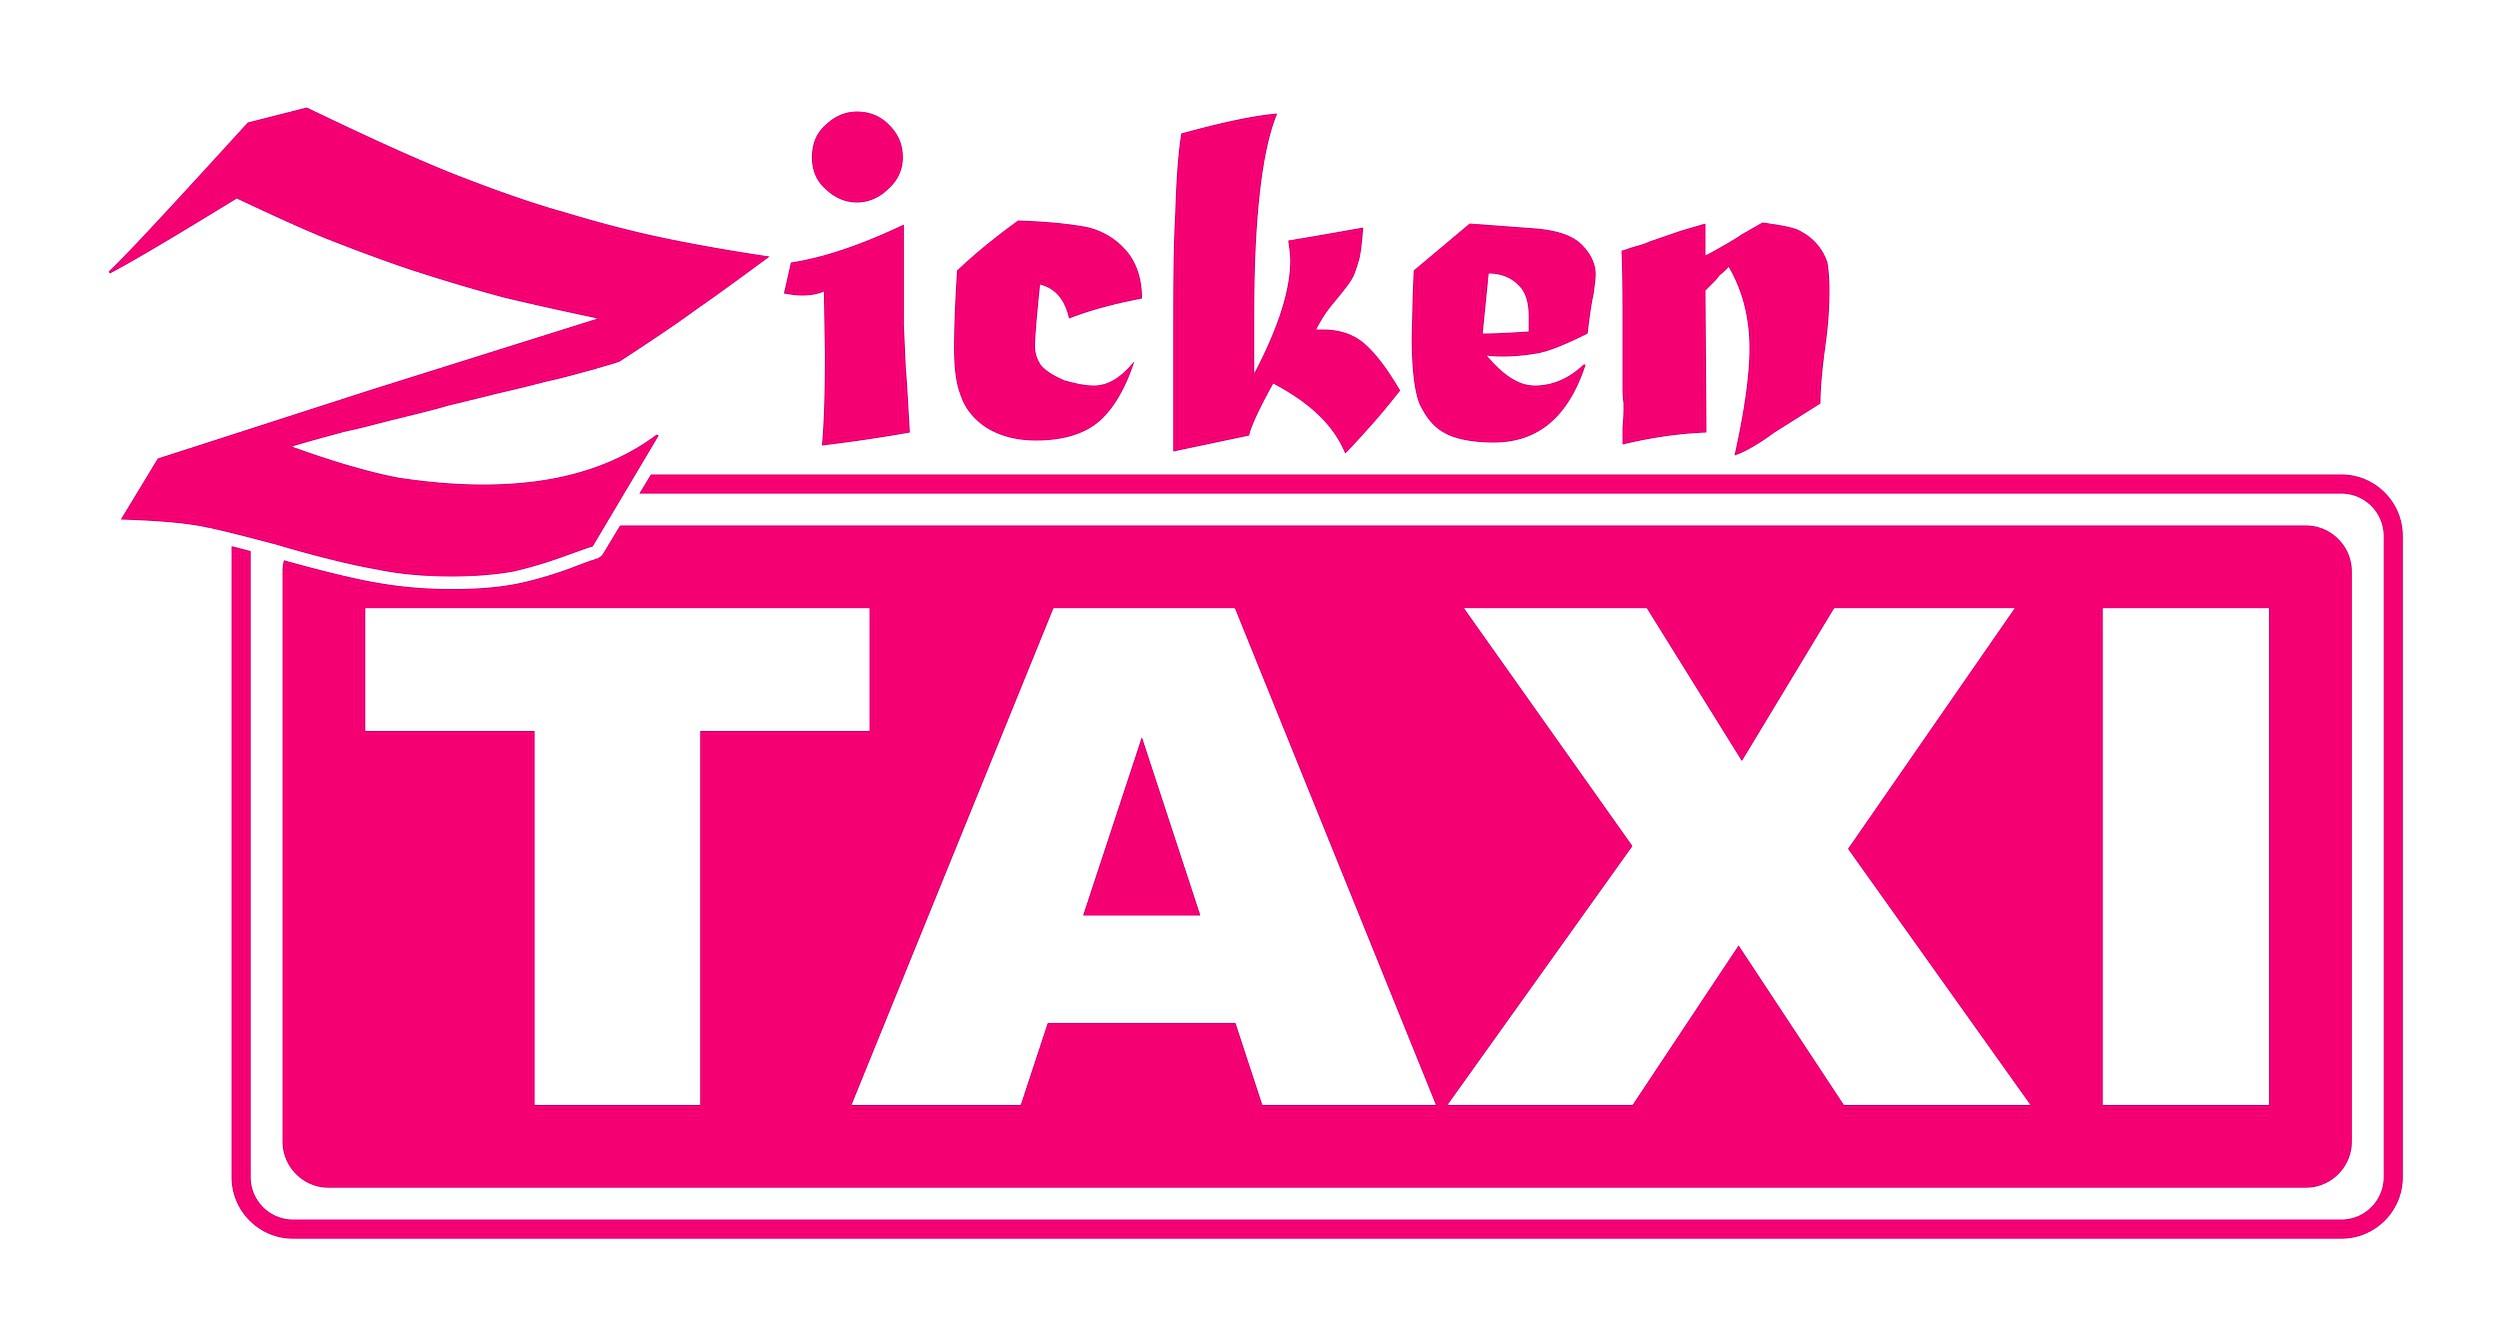 Autocollant Zicken Taxi 145 x 115 mm – Bild 1